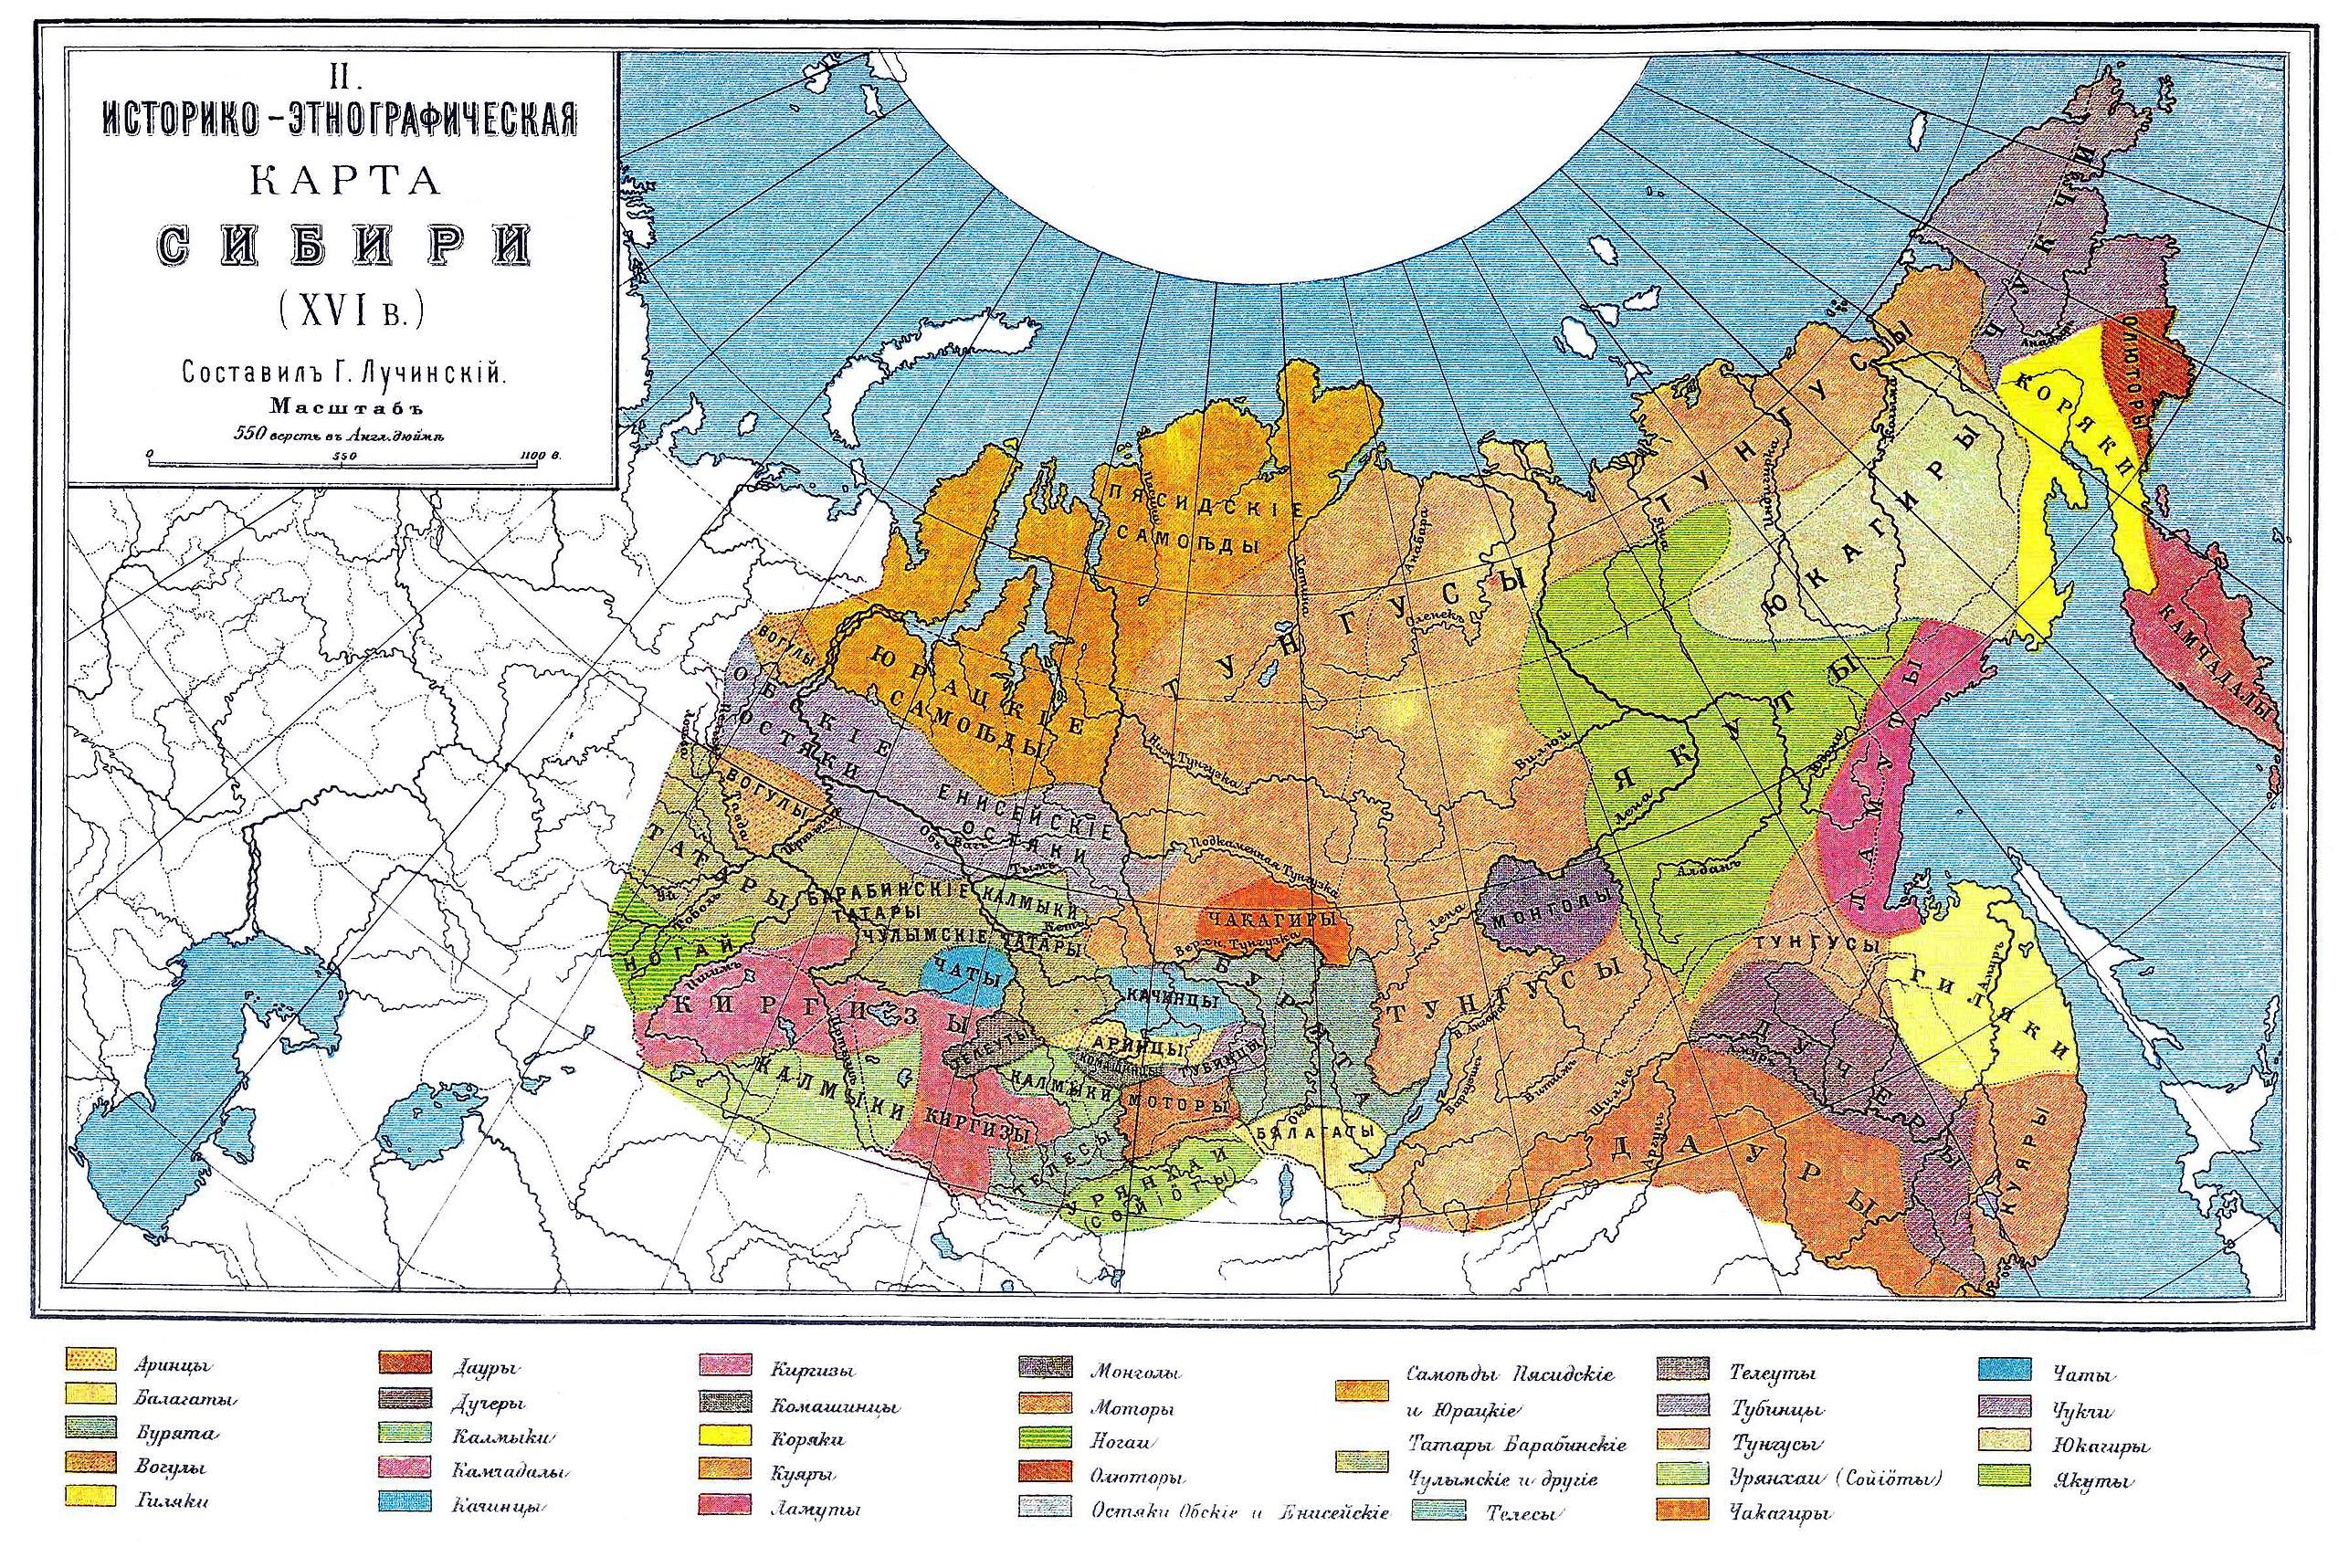 2560px-Brockhaus_and_Efron_Encyclopedic_Dictionary_b58_809-0